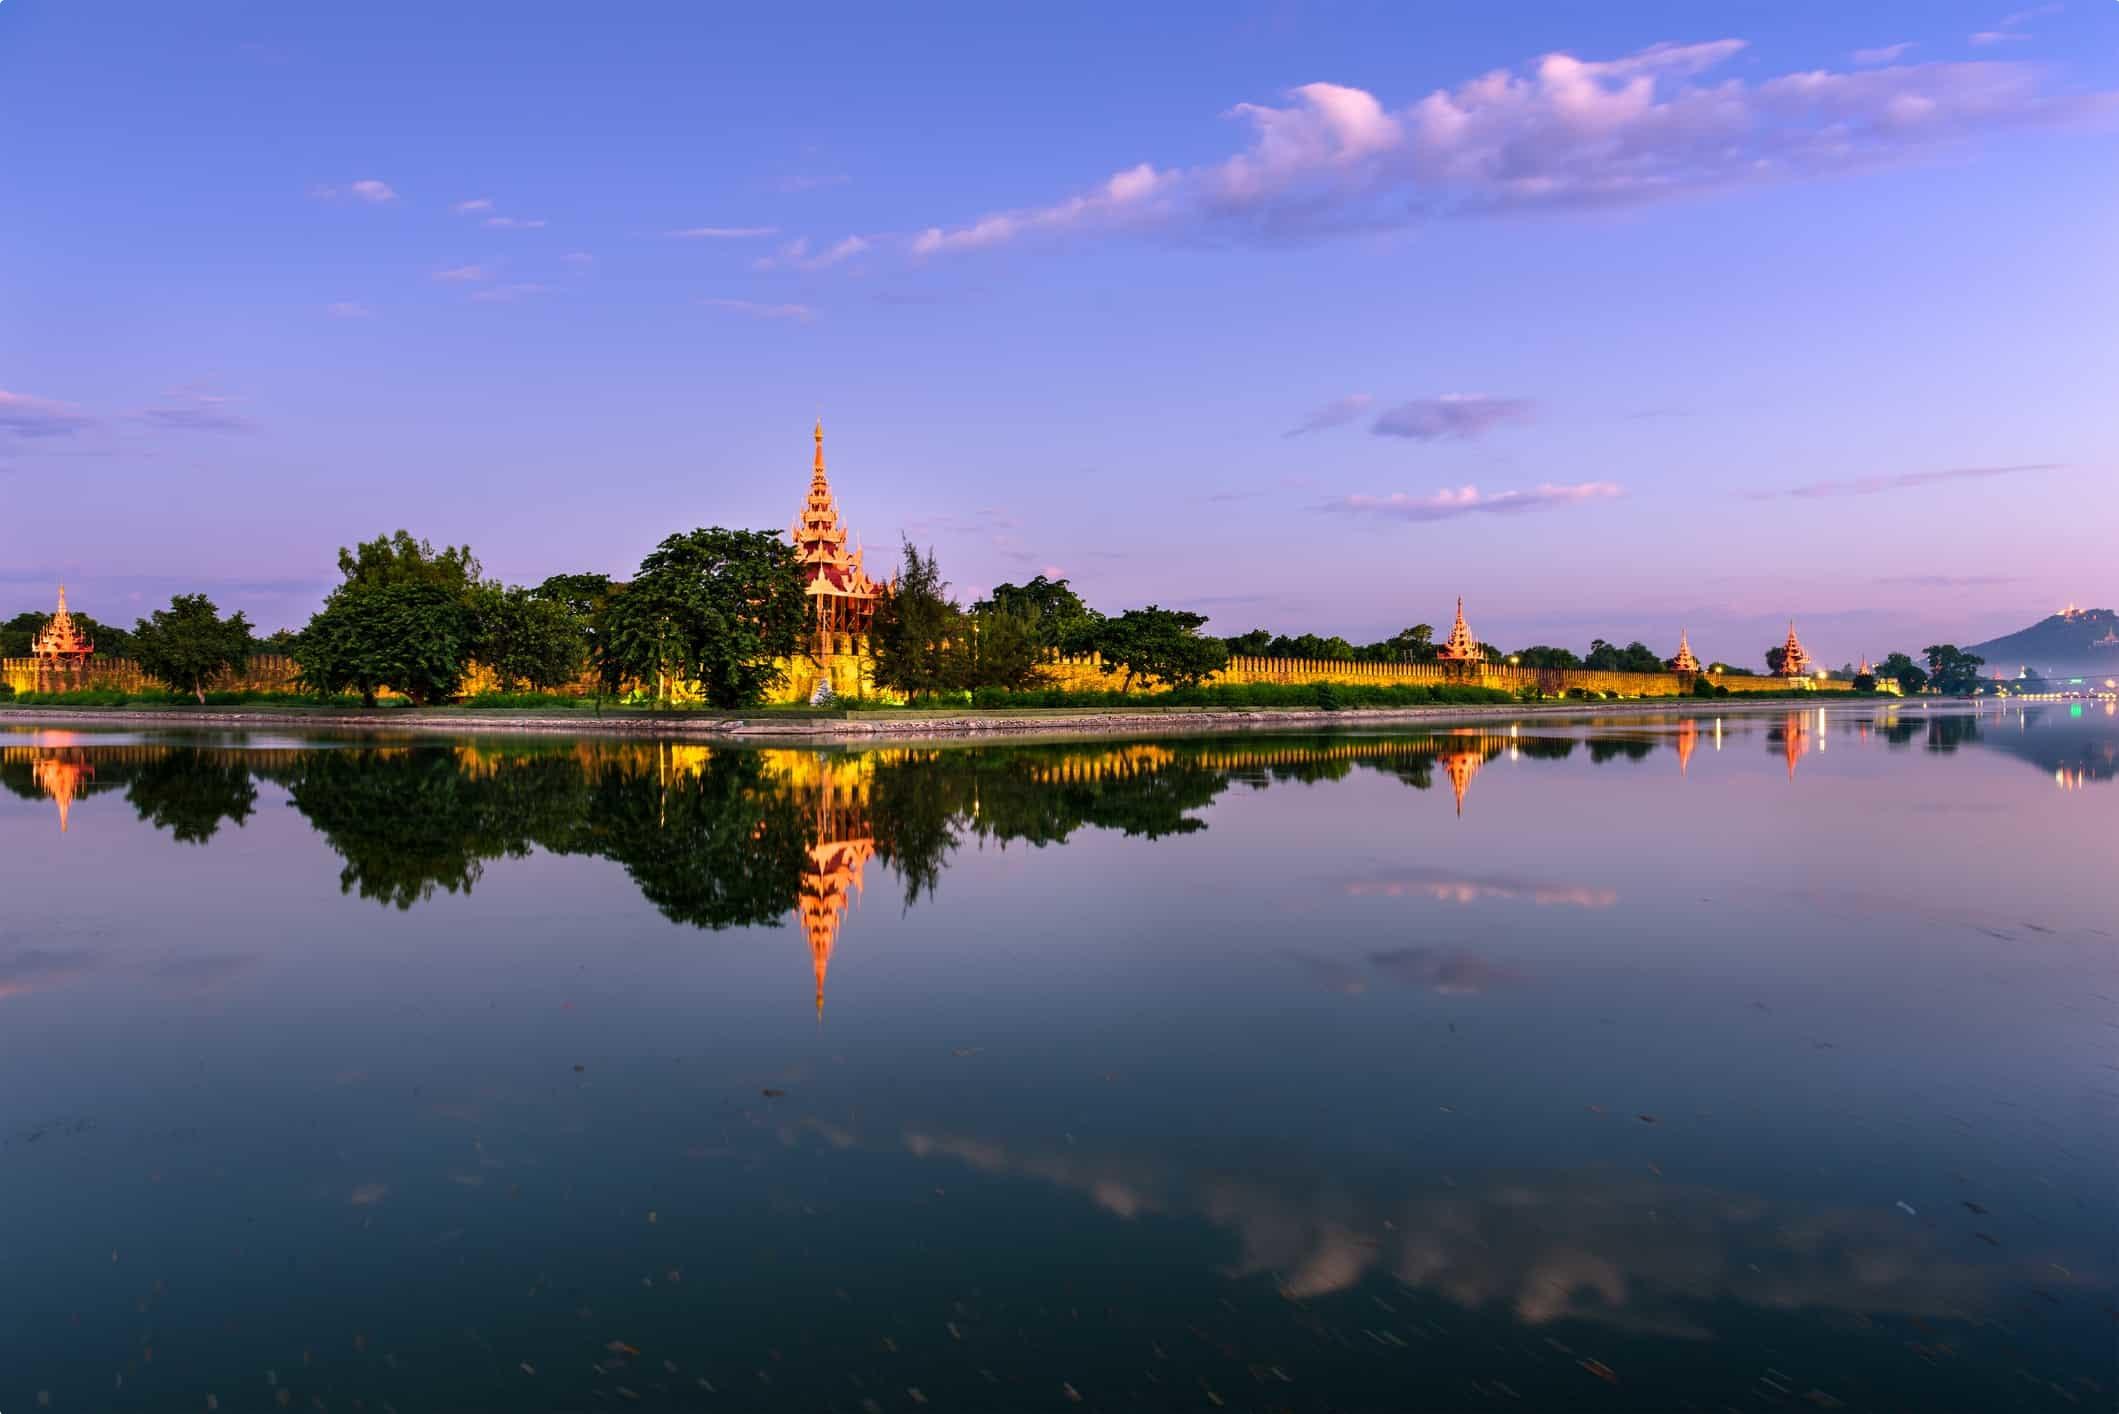 View of Mandalay Palace Myanmar